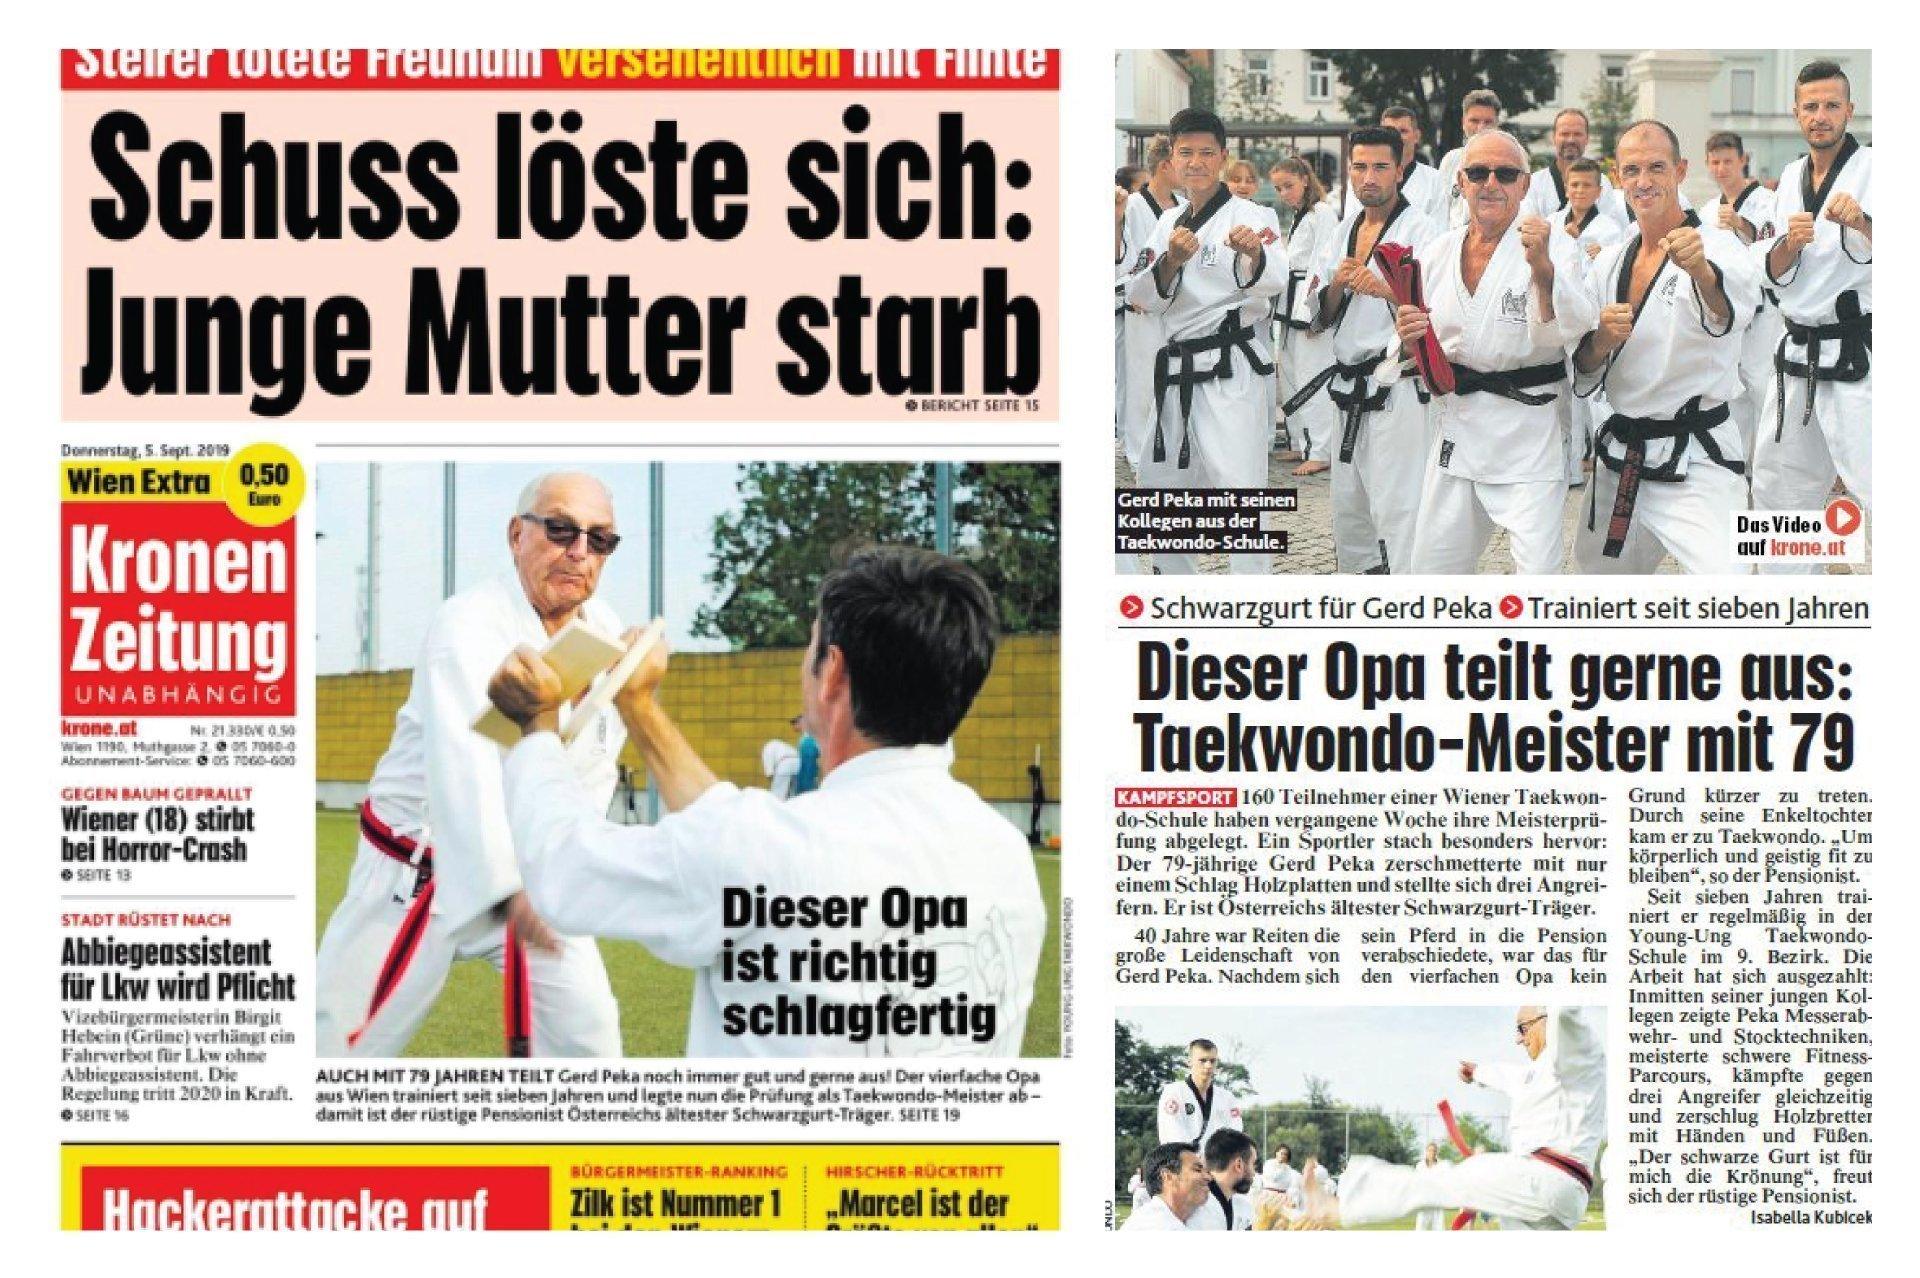 YOUNG-UNG Taekwondo Gerd Peka Kronen Zeitung